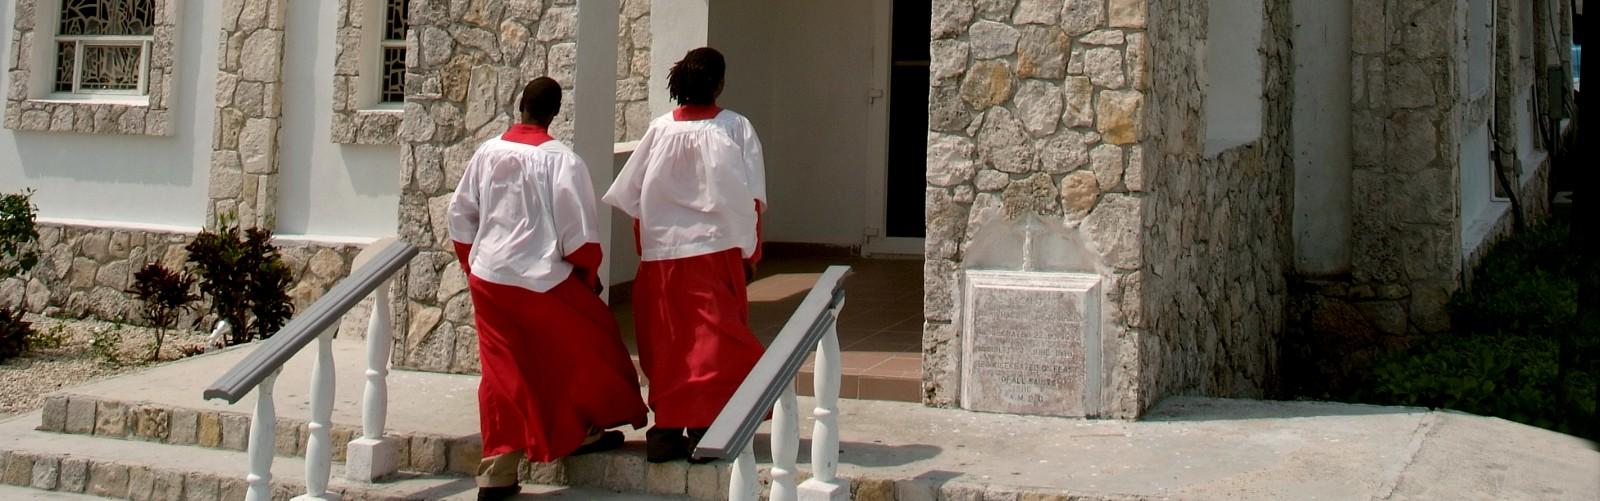 Grand Bahamas Churches